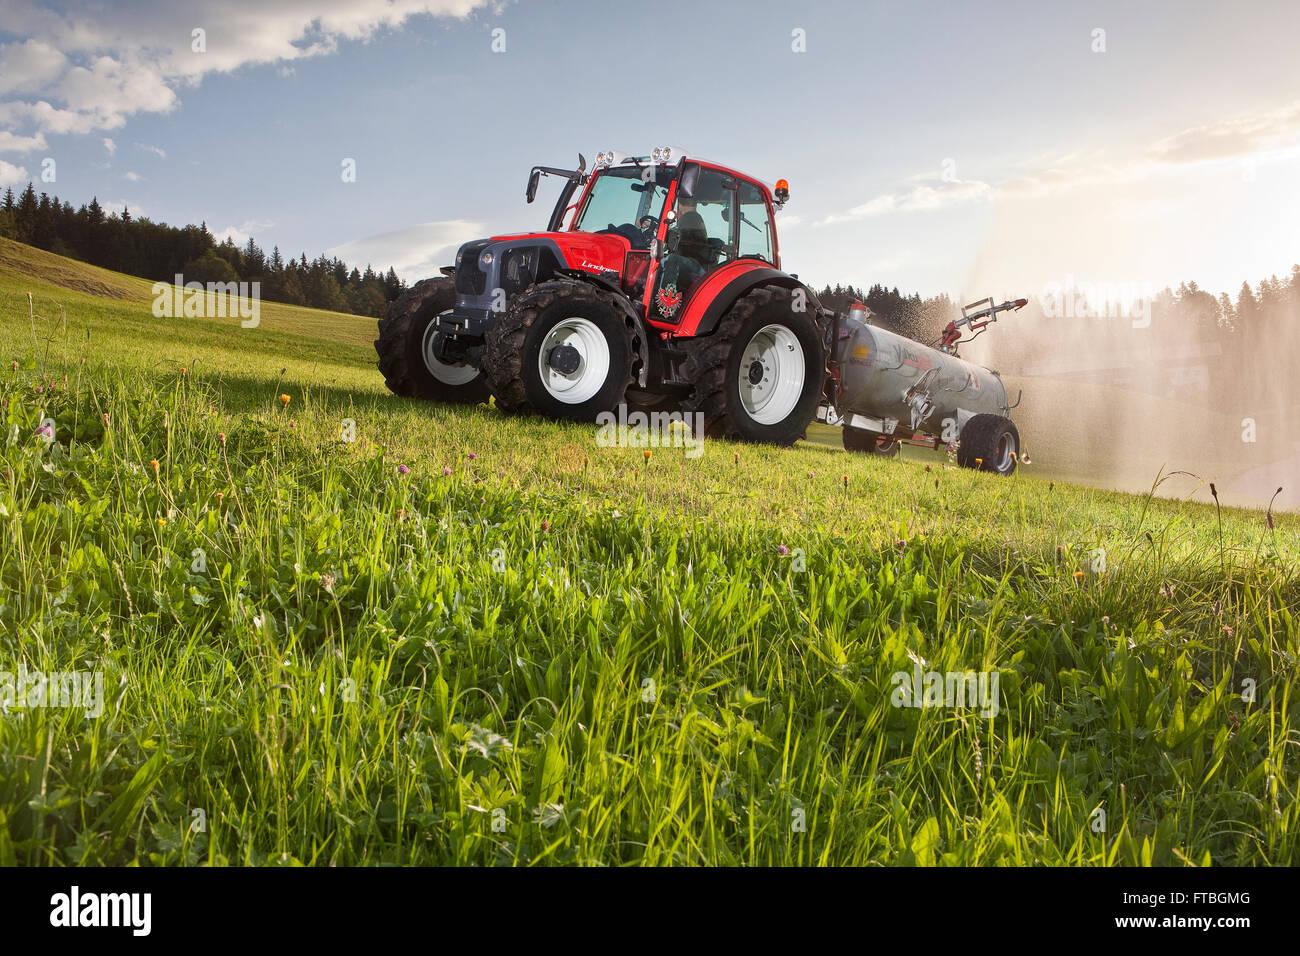 Manure spreader fertilizing a field, Breitenbach am Inn, Inn Valley, Tyrol, Austria - Stock Image